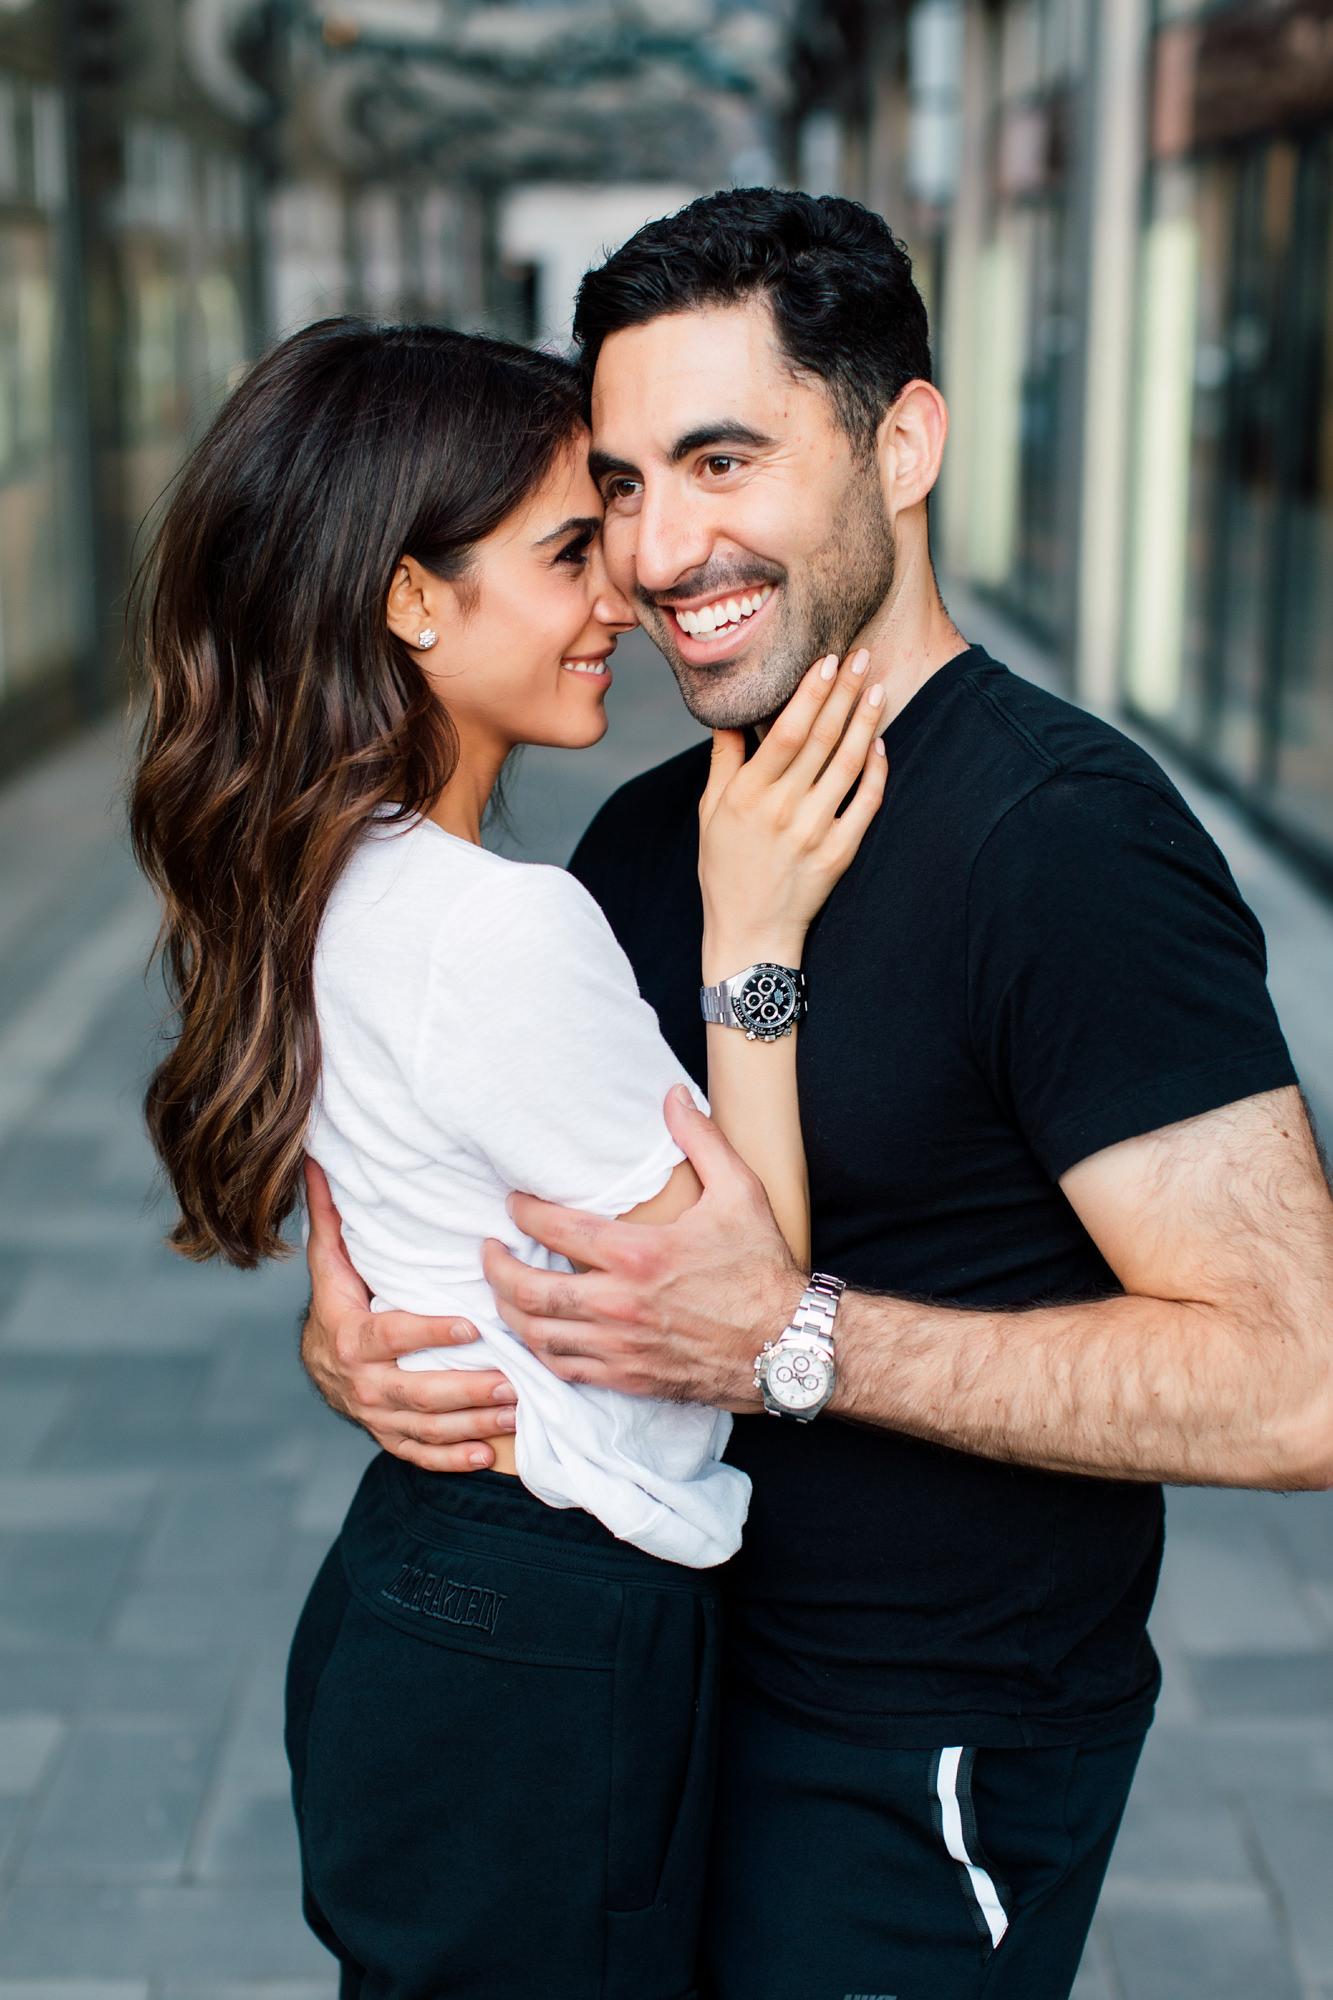 yorkville couple